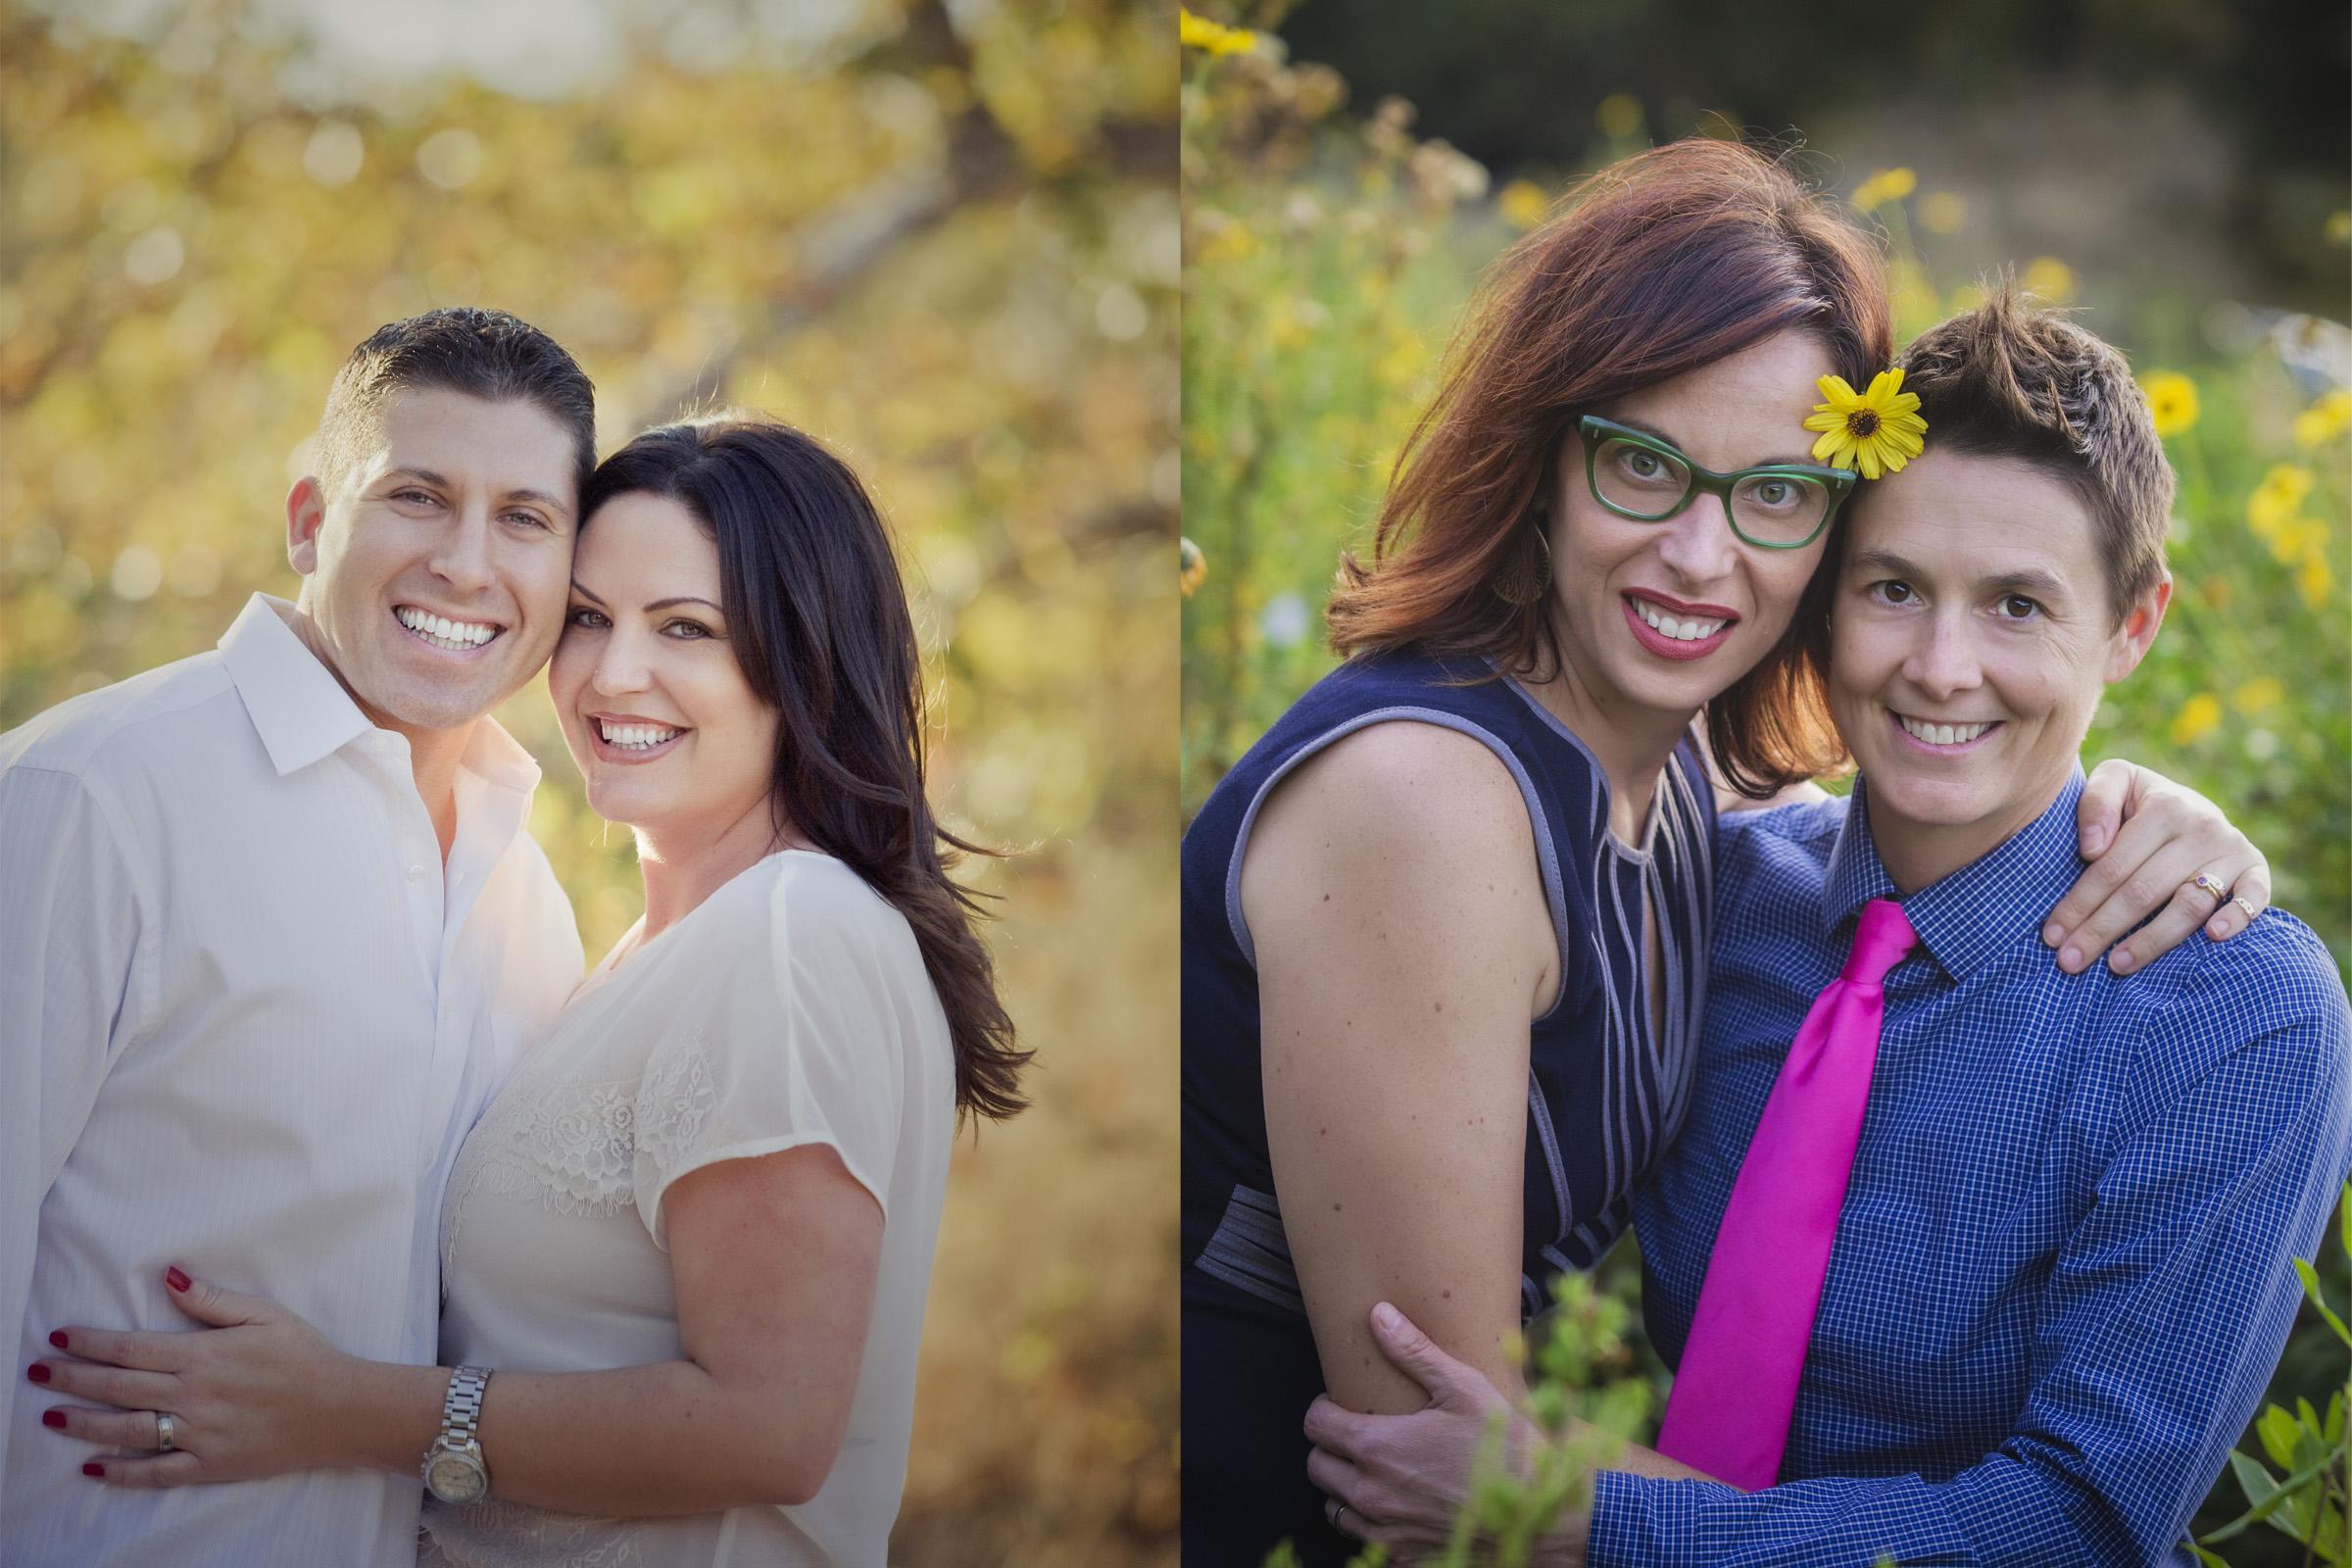 couples-08.jpg